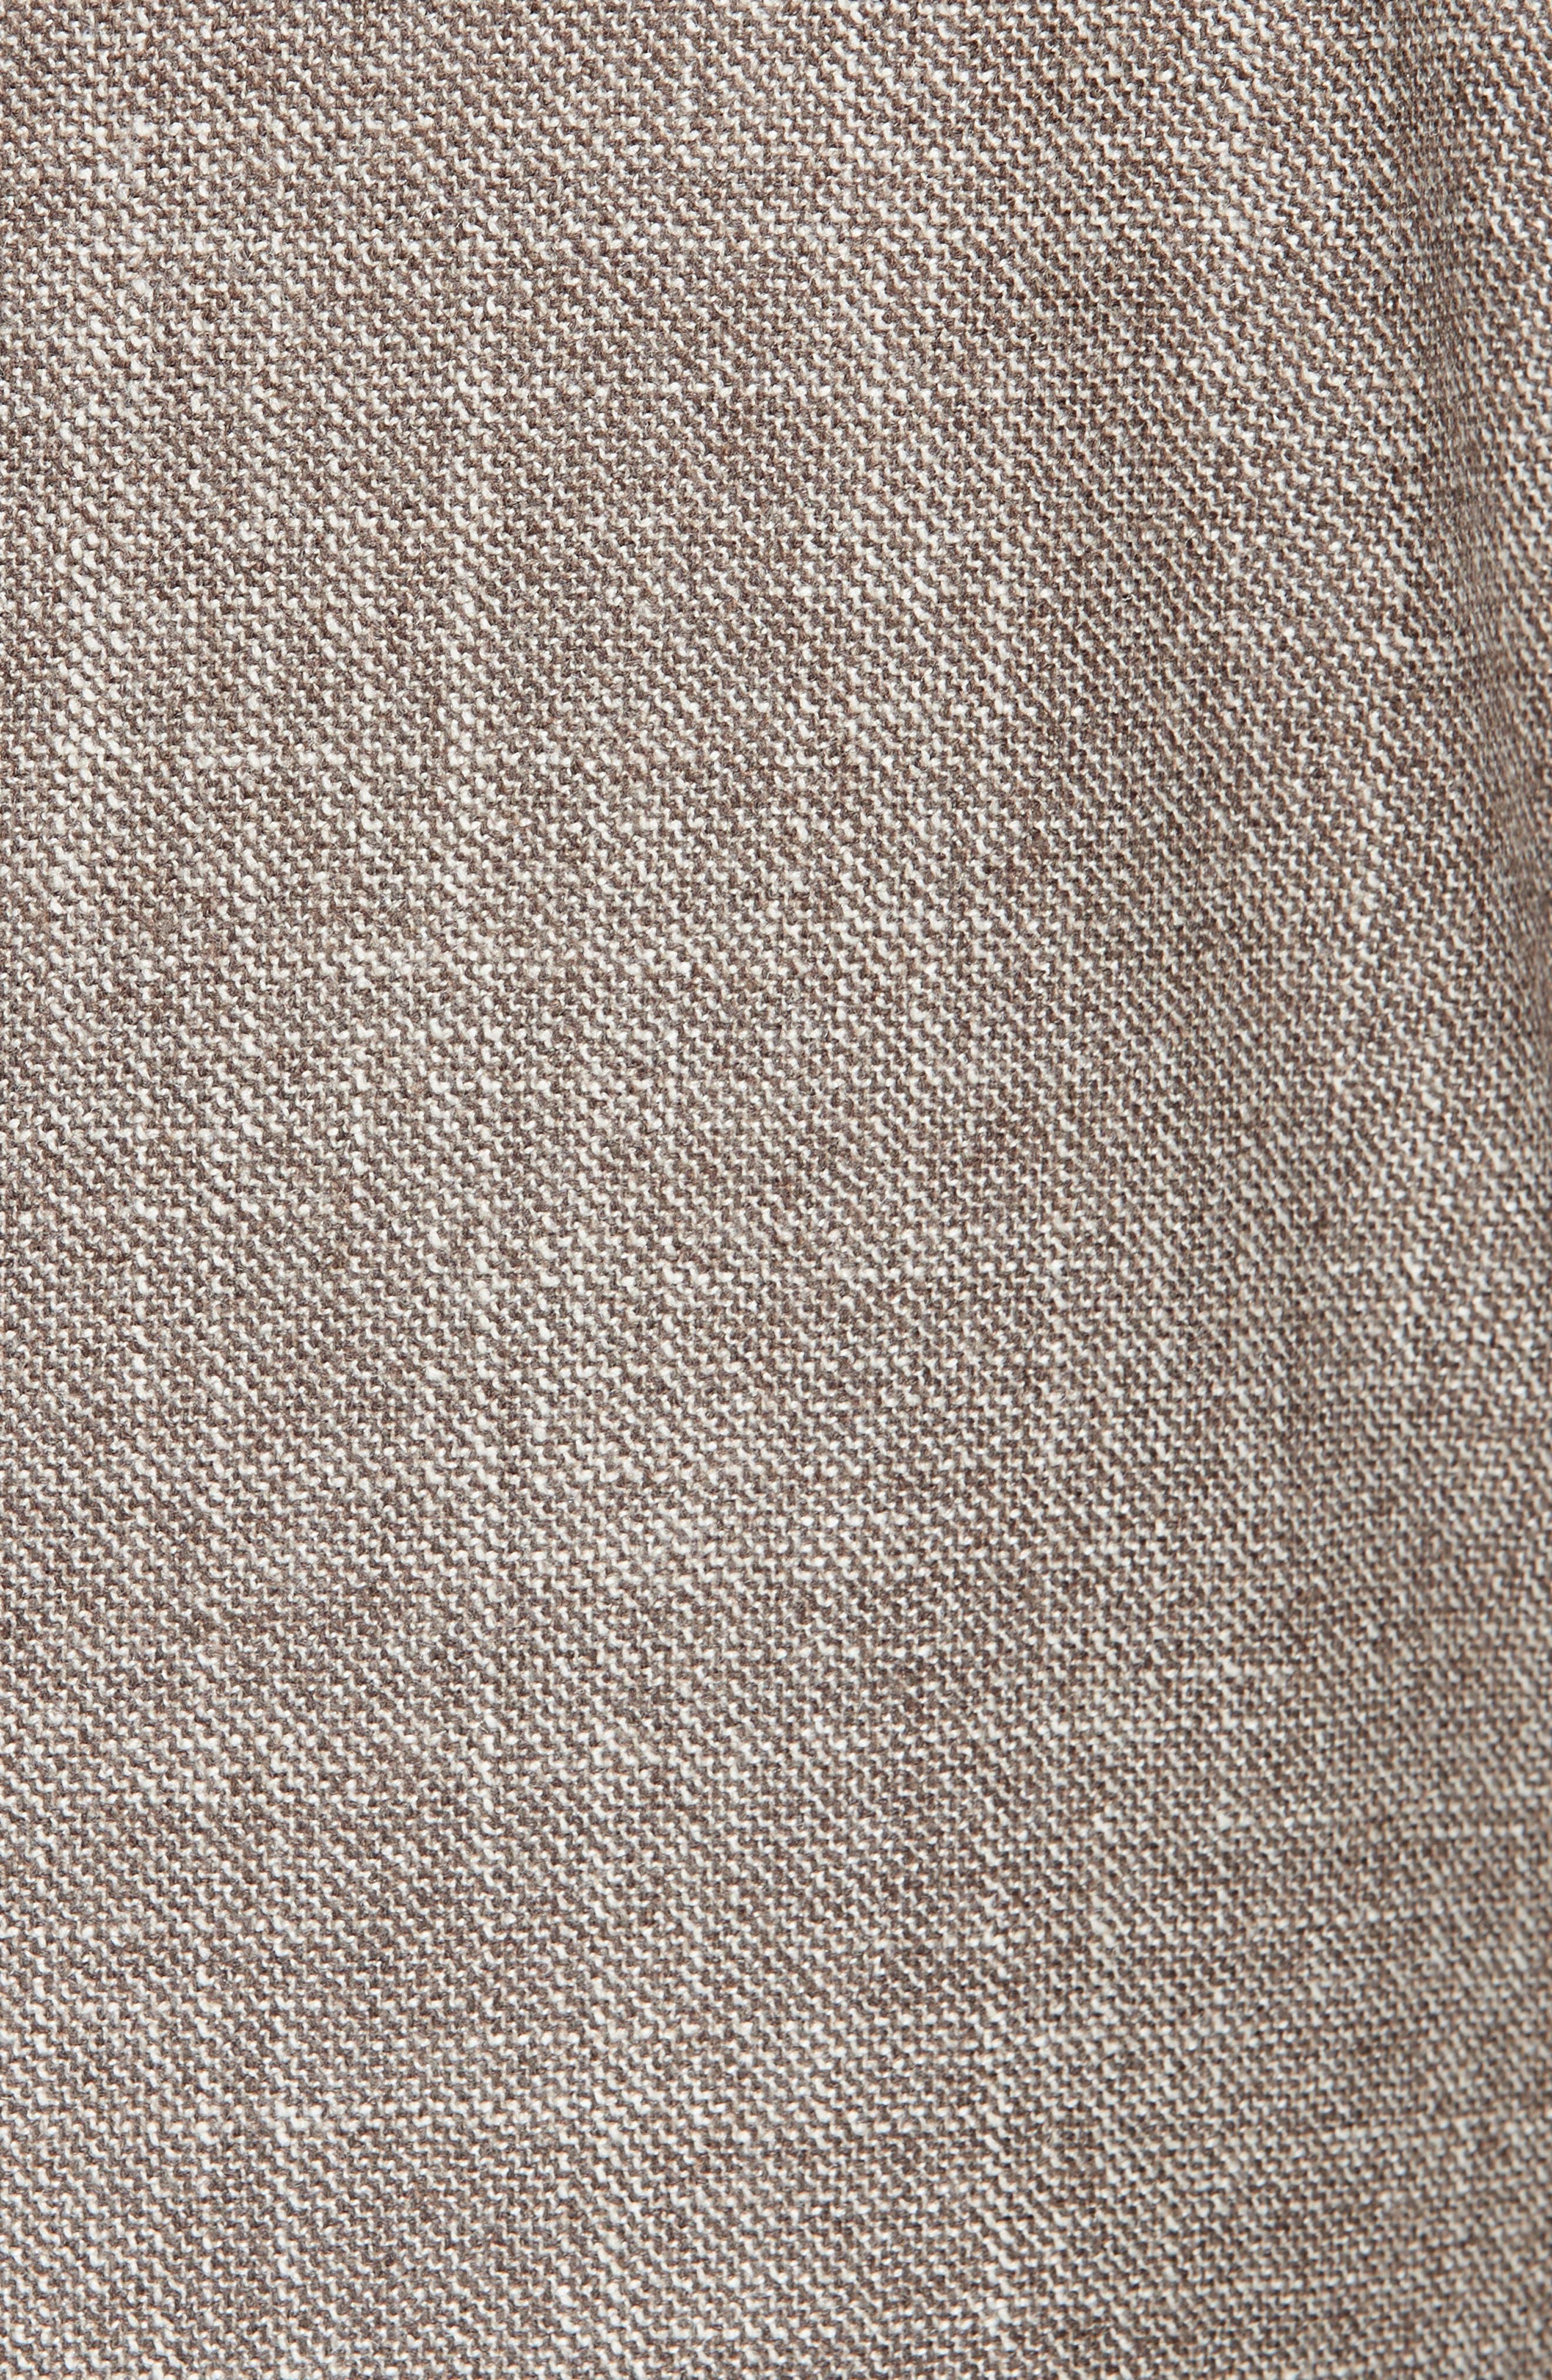 Trim Fit Wool Blend Blazer,                             Alternate thumbnail 6, color,                             250